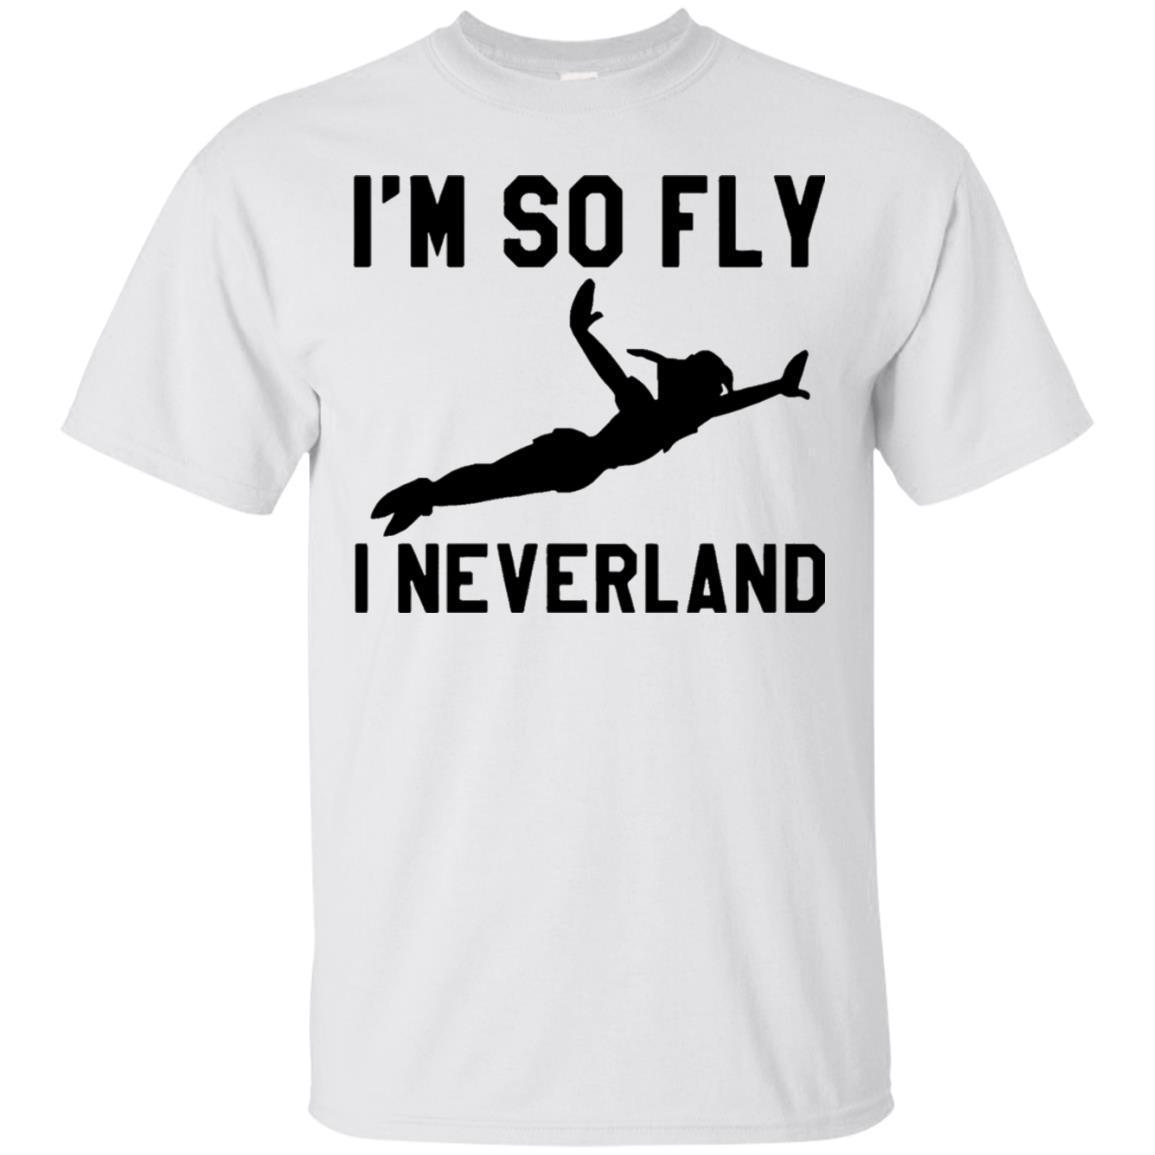 I'm So Fly I Neverland shirt